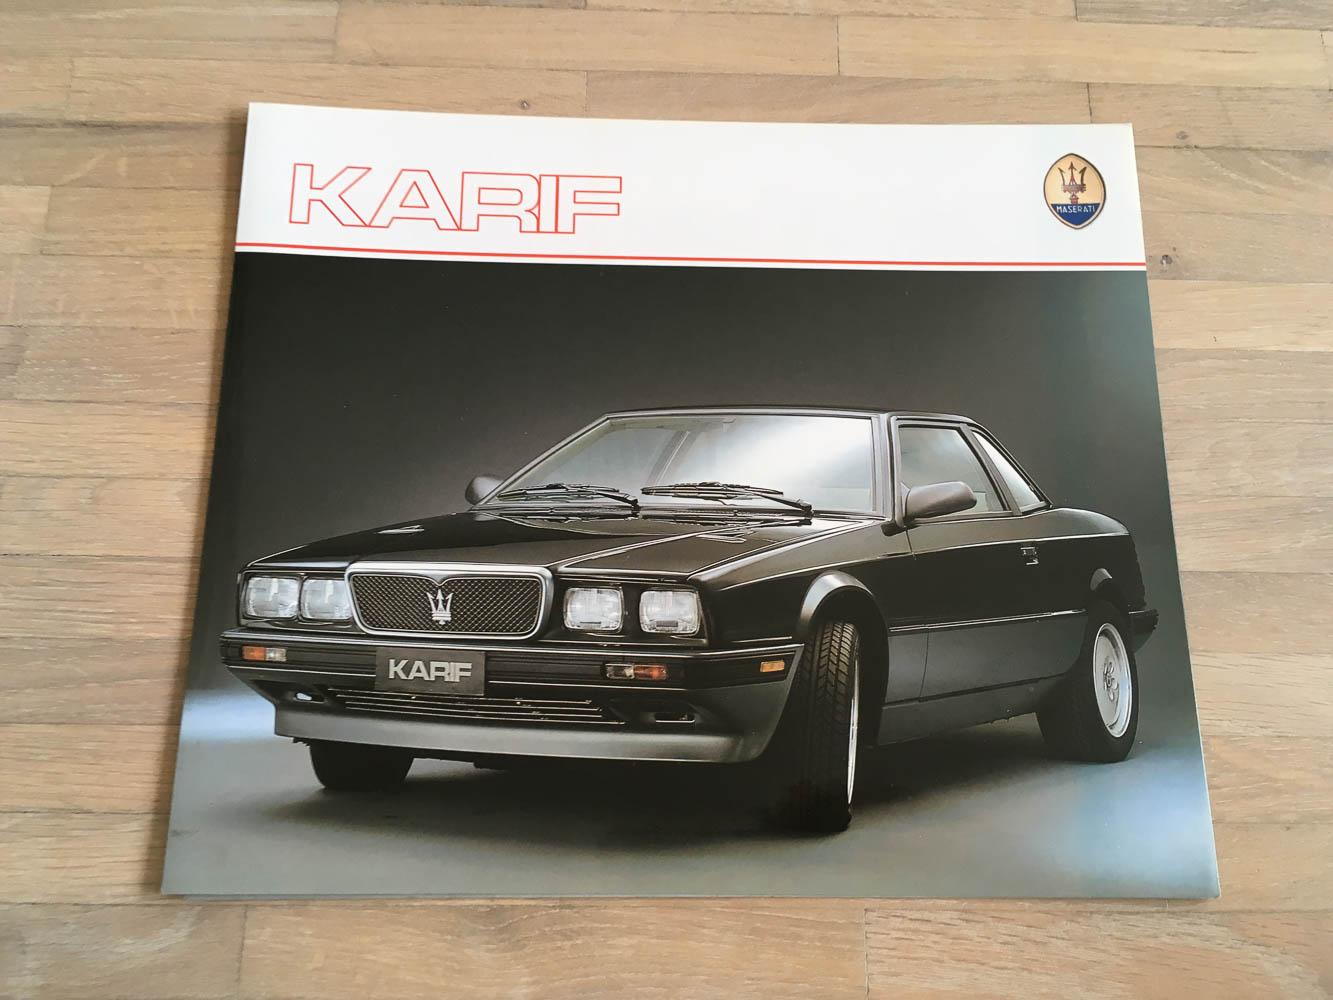 Maserati Karif /ca. 89 - Autoprospekte-Sammlung